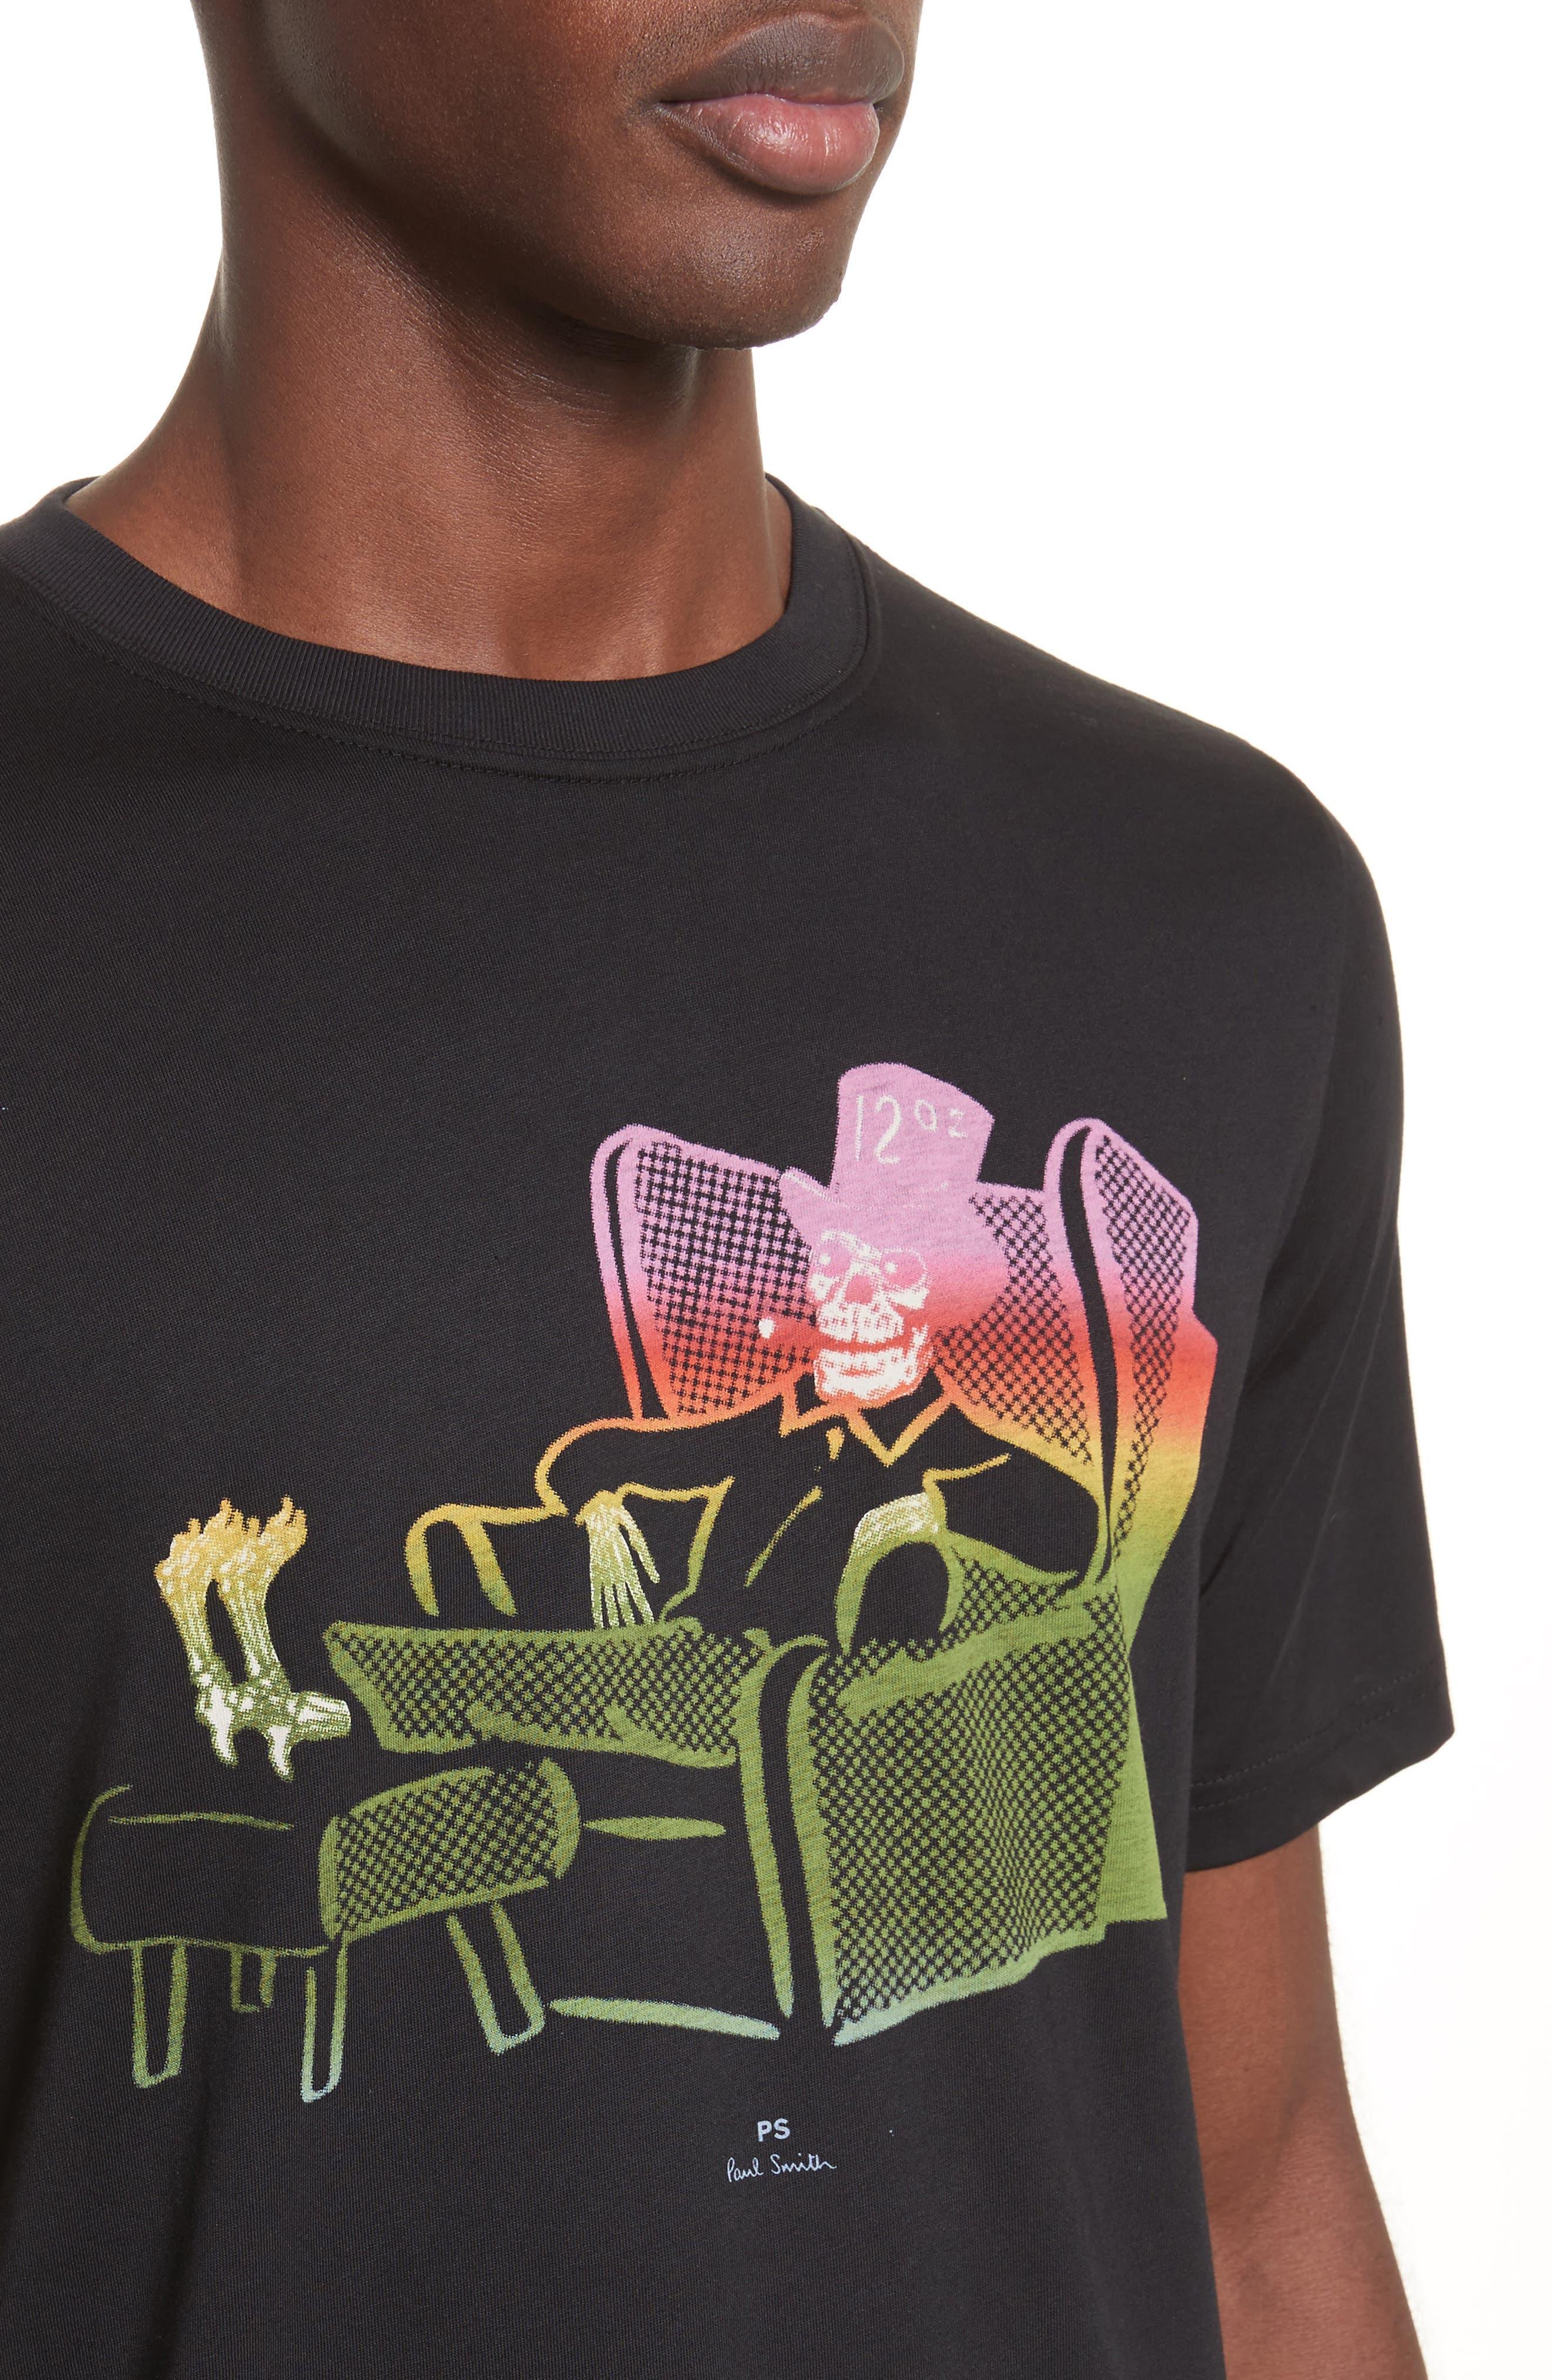 12oz Skeleton Graphic T-Shirt,                             Alternate thumbnail 4, color,                             001